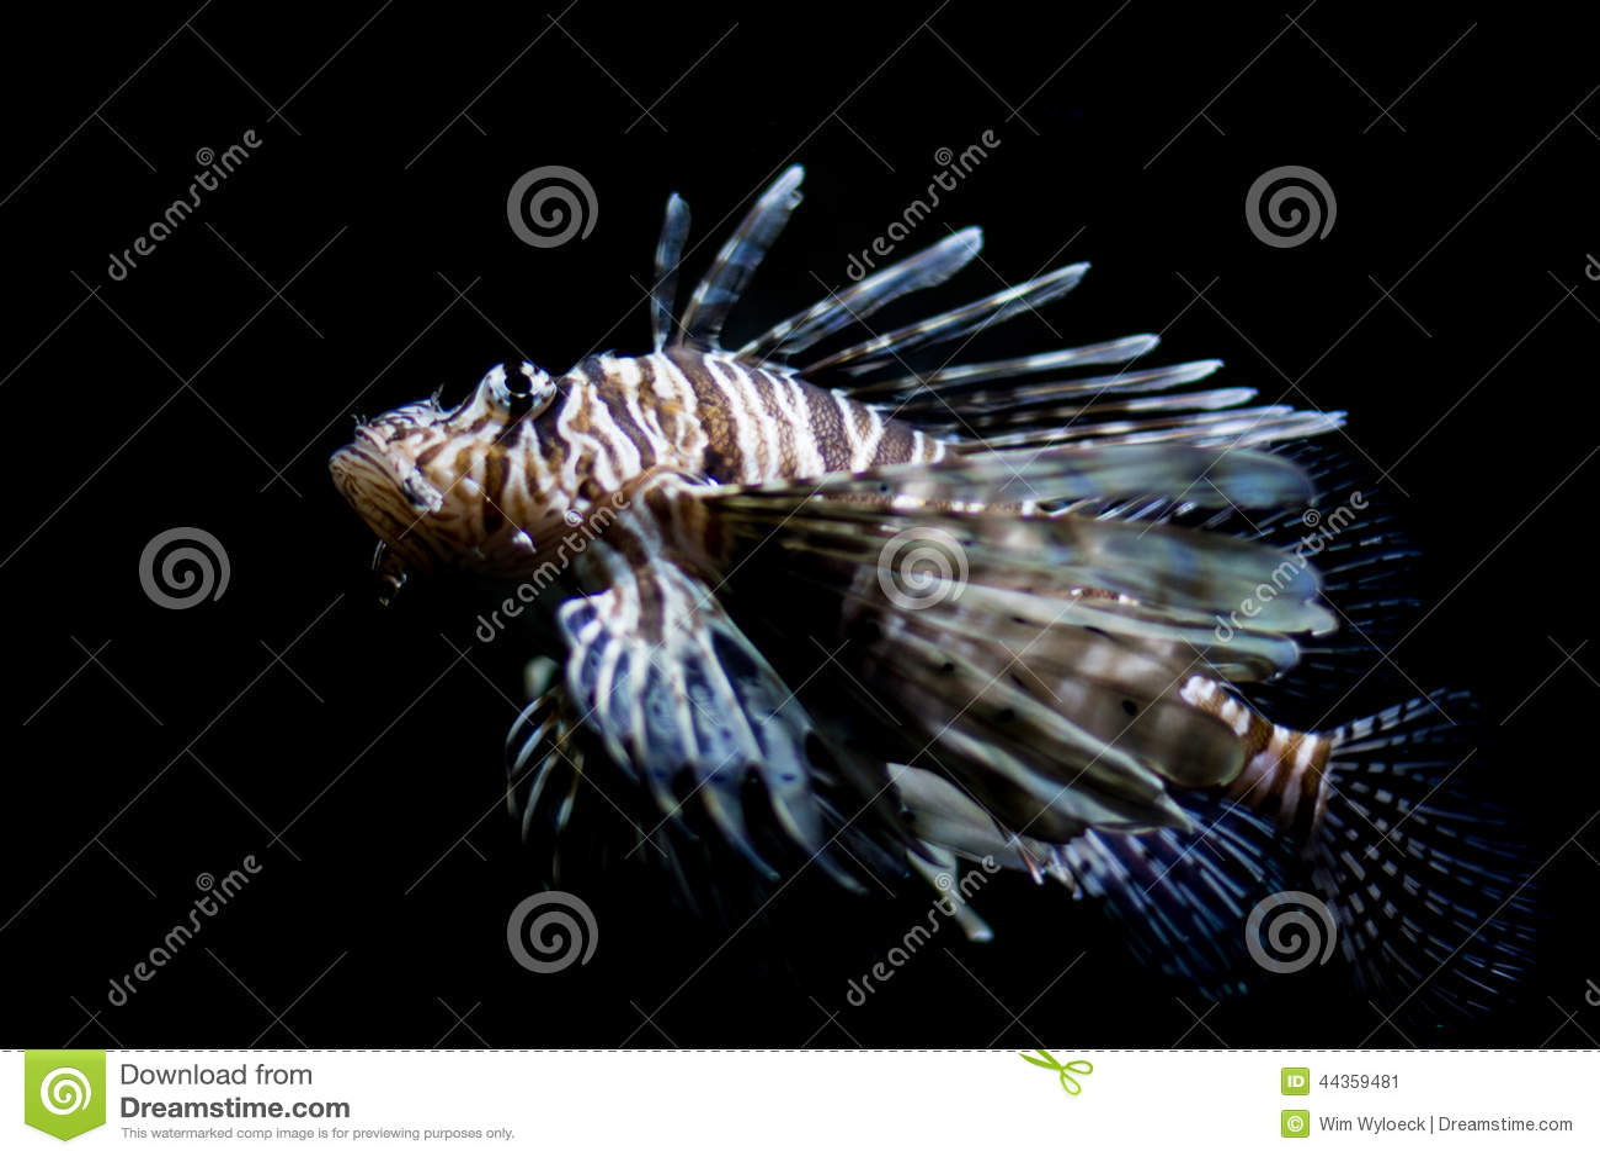 Lionfish, foto a figura intera